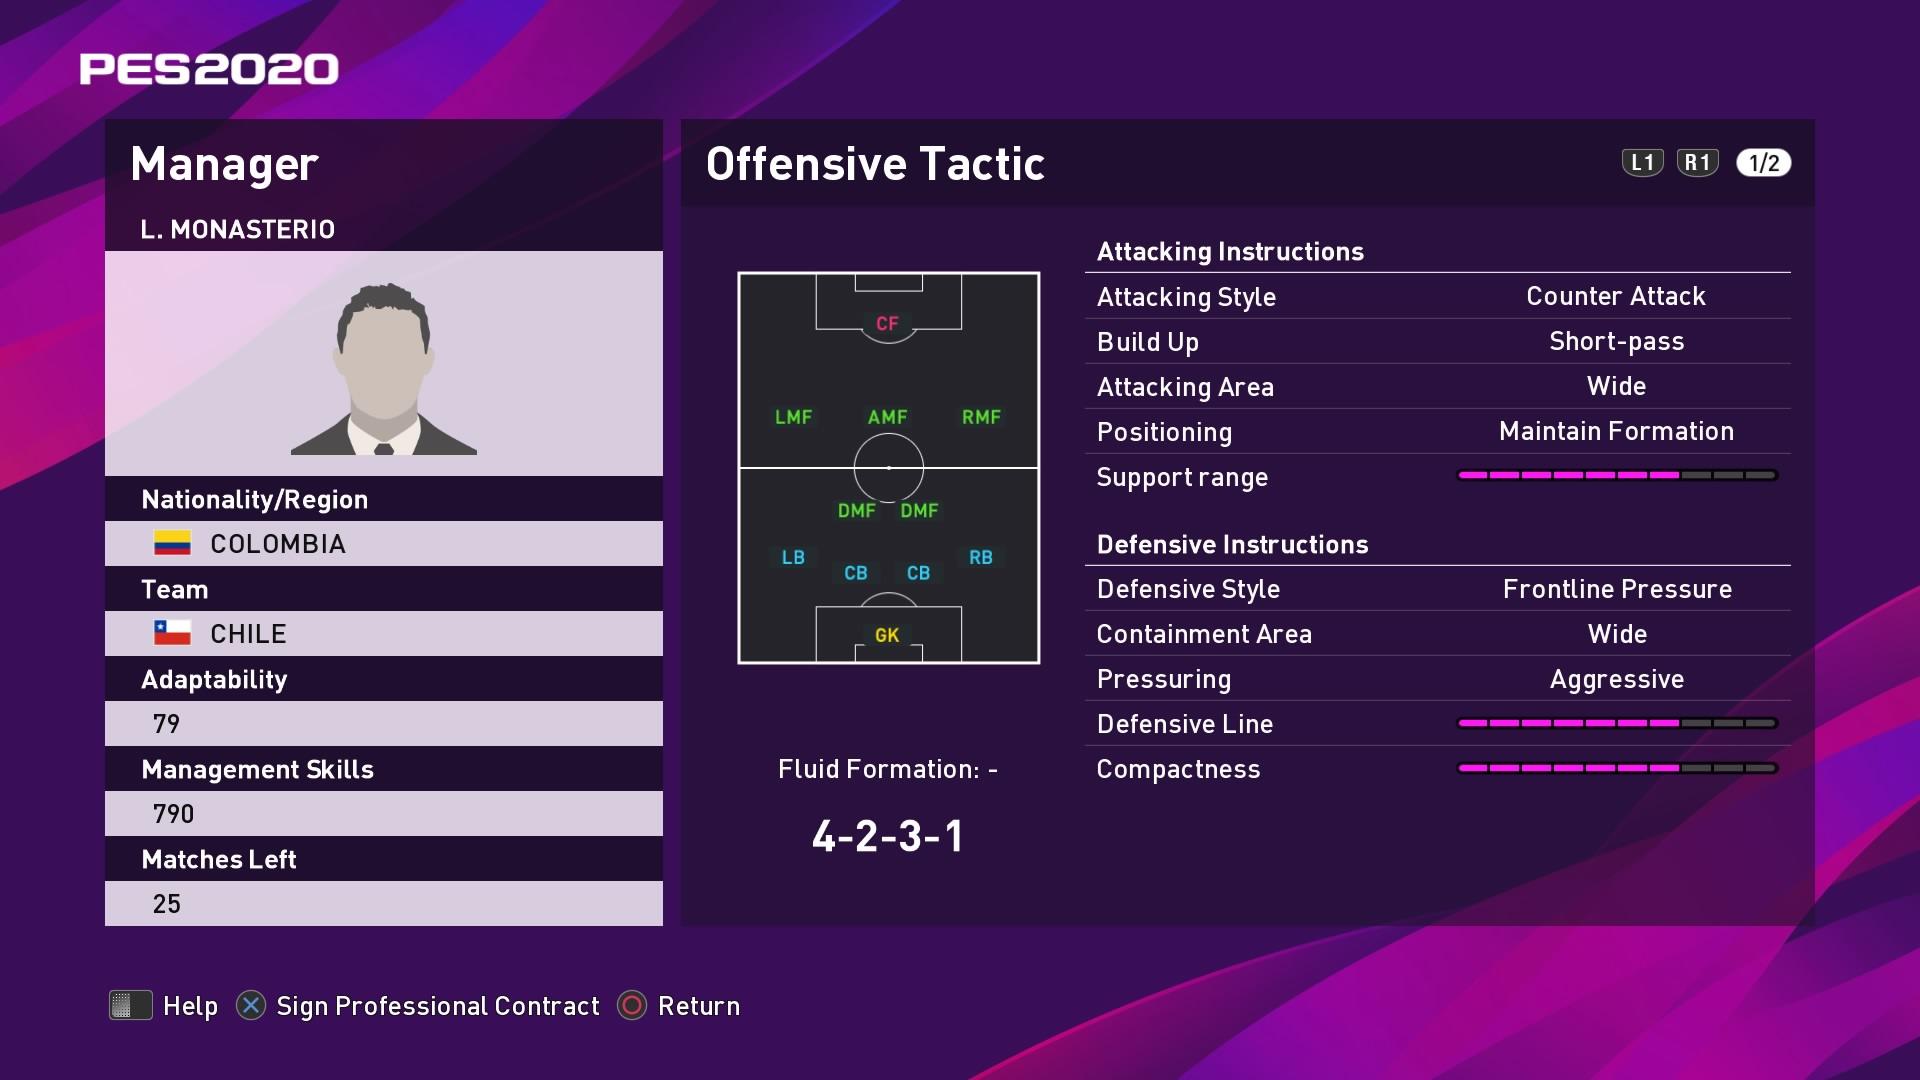 L. Monasterio (Reinaldo Rueda) Offensive Tactic in PES 2020 myClub